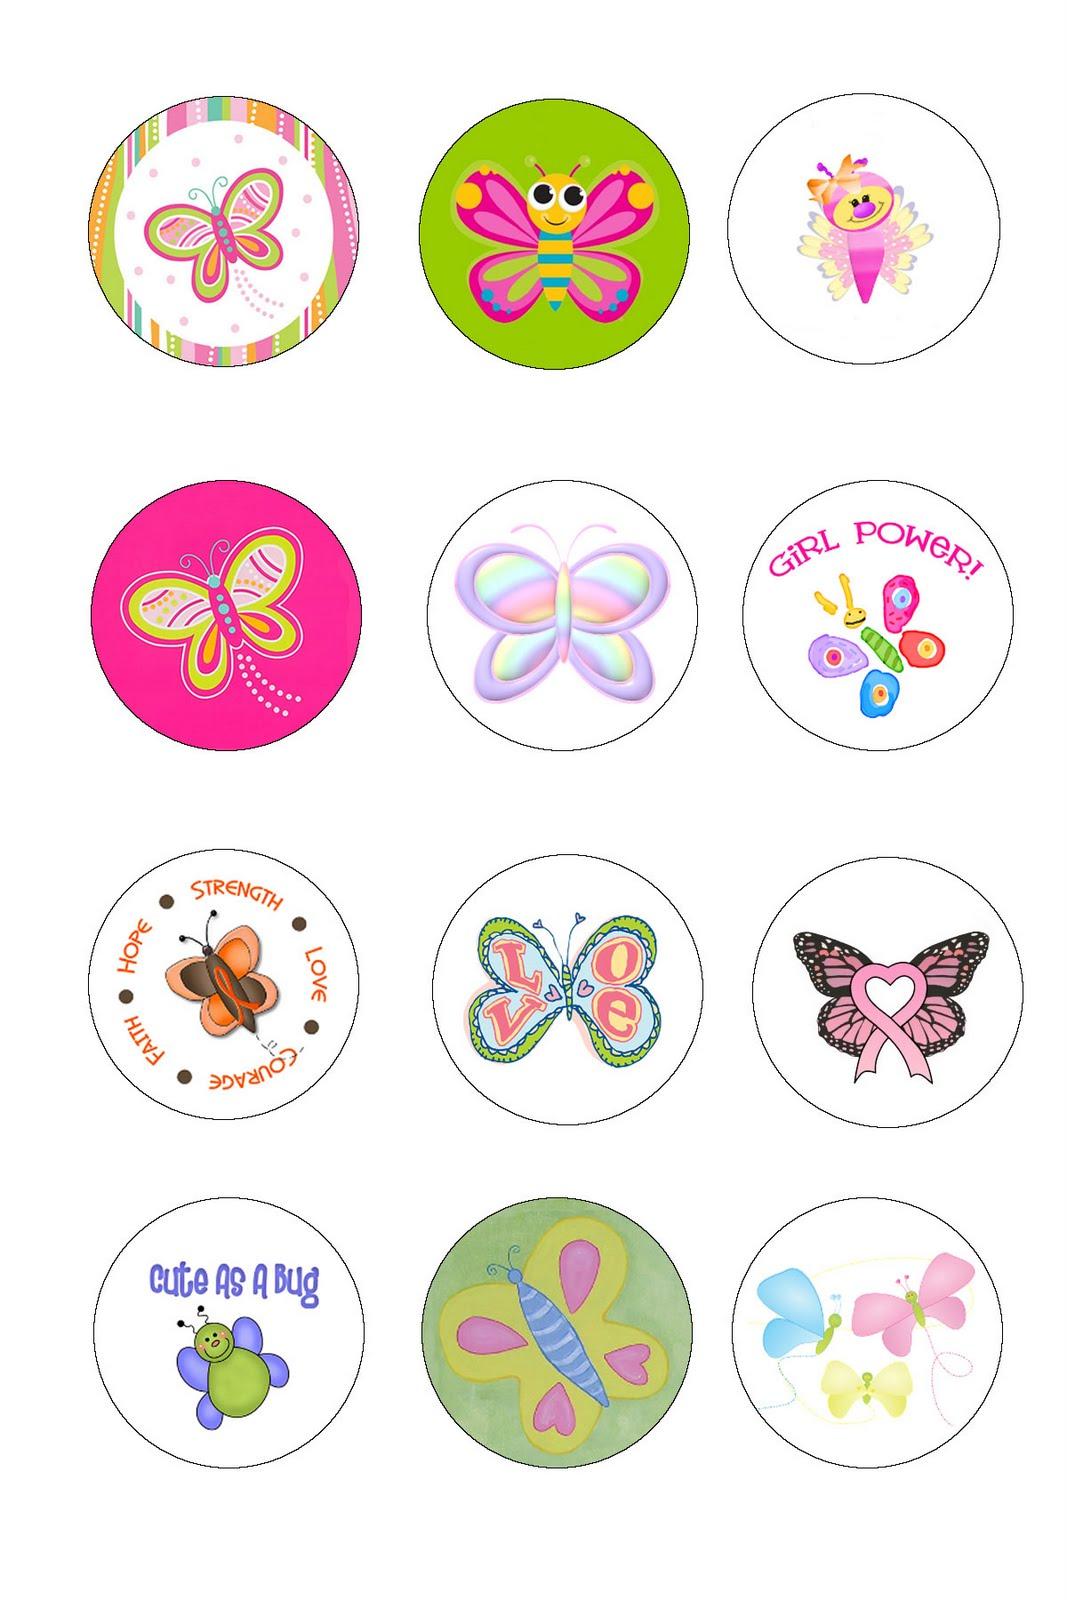 Pin free print bottle cap designs pictures on pinterest for Bottle cap designs